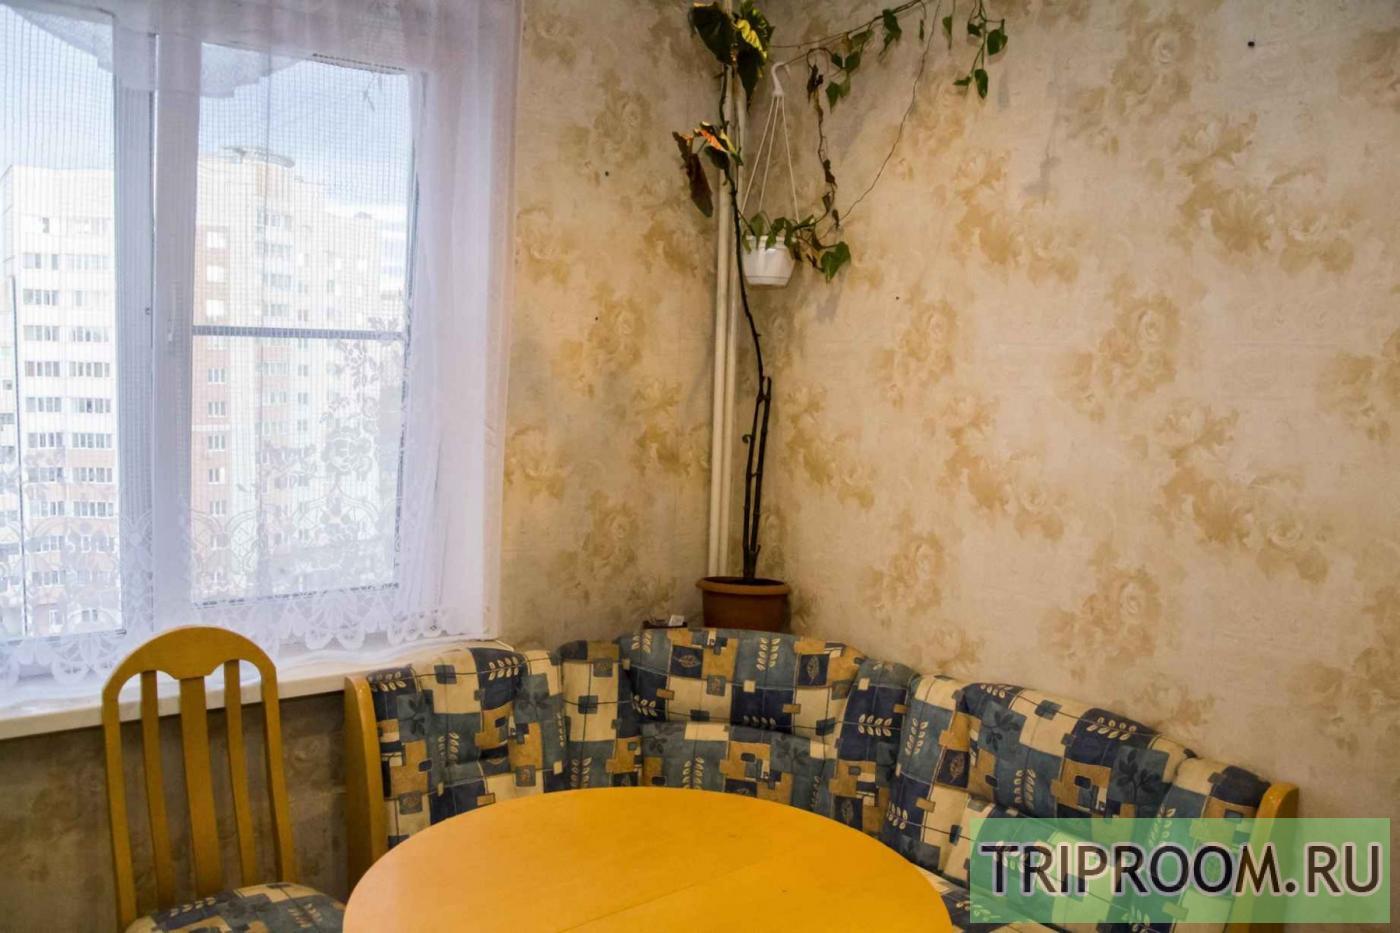 1-комнатная квартира посуточно (вариант № 21406), ул. Стаханова улица, фото № 5